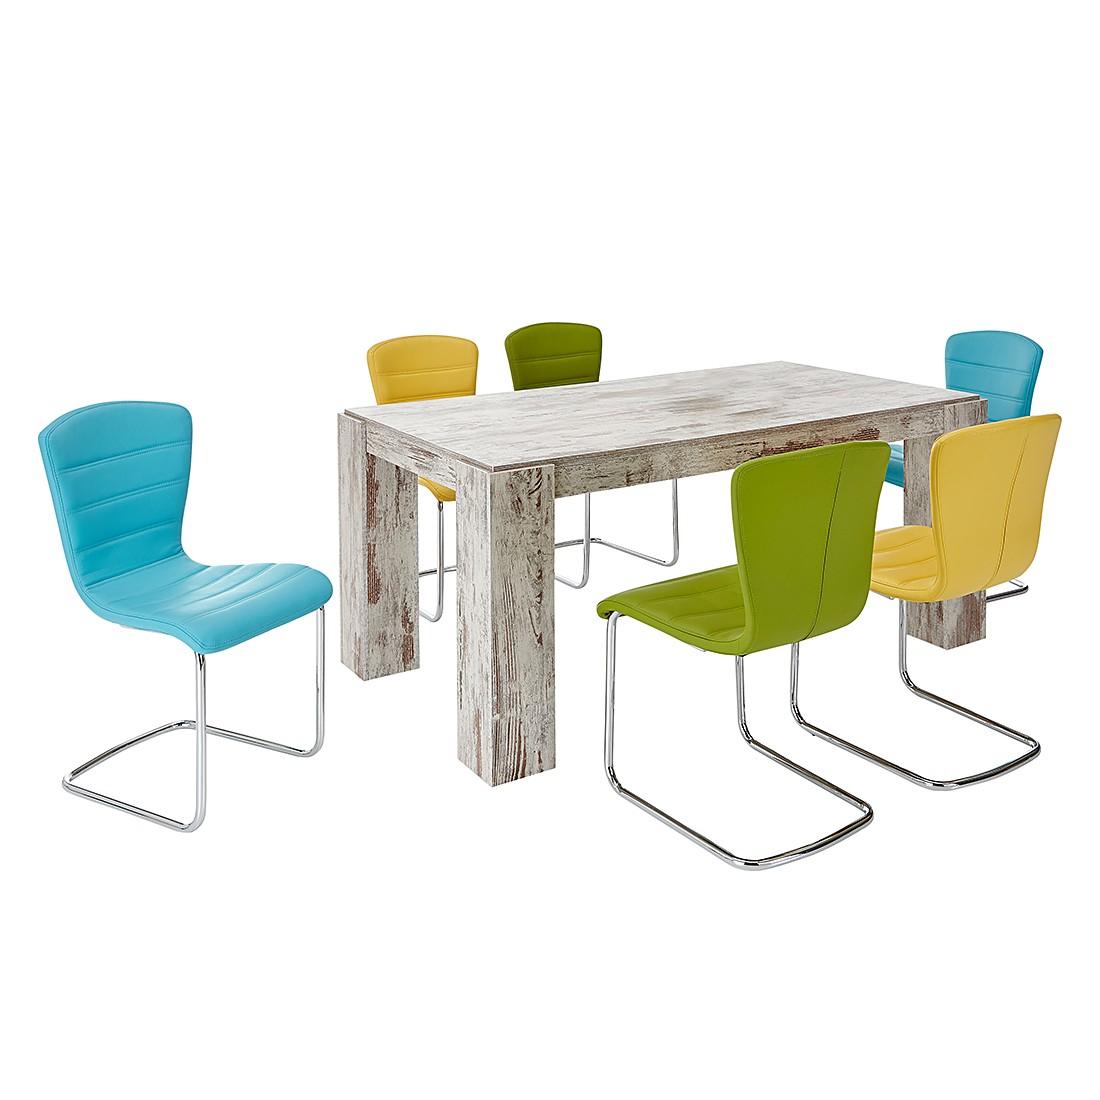 Essgruppe Wido I (7-teilig) – Mehrfarbig, Home Design online bestellen